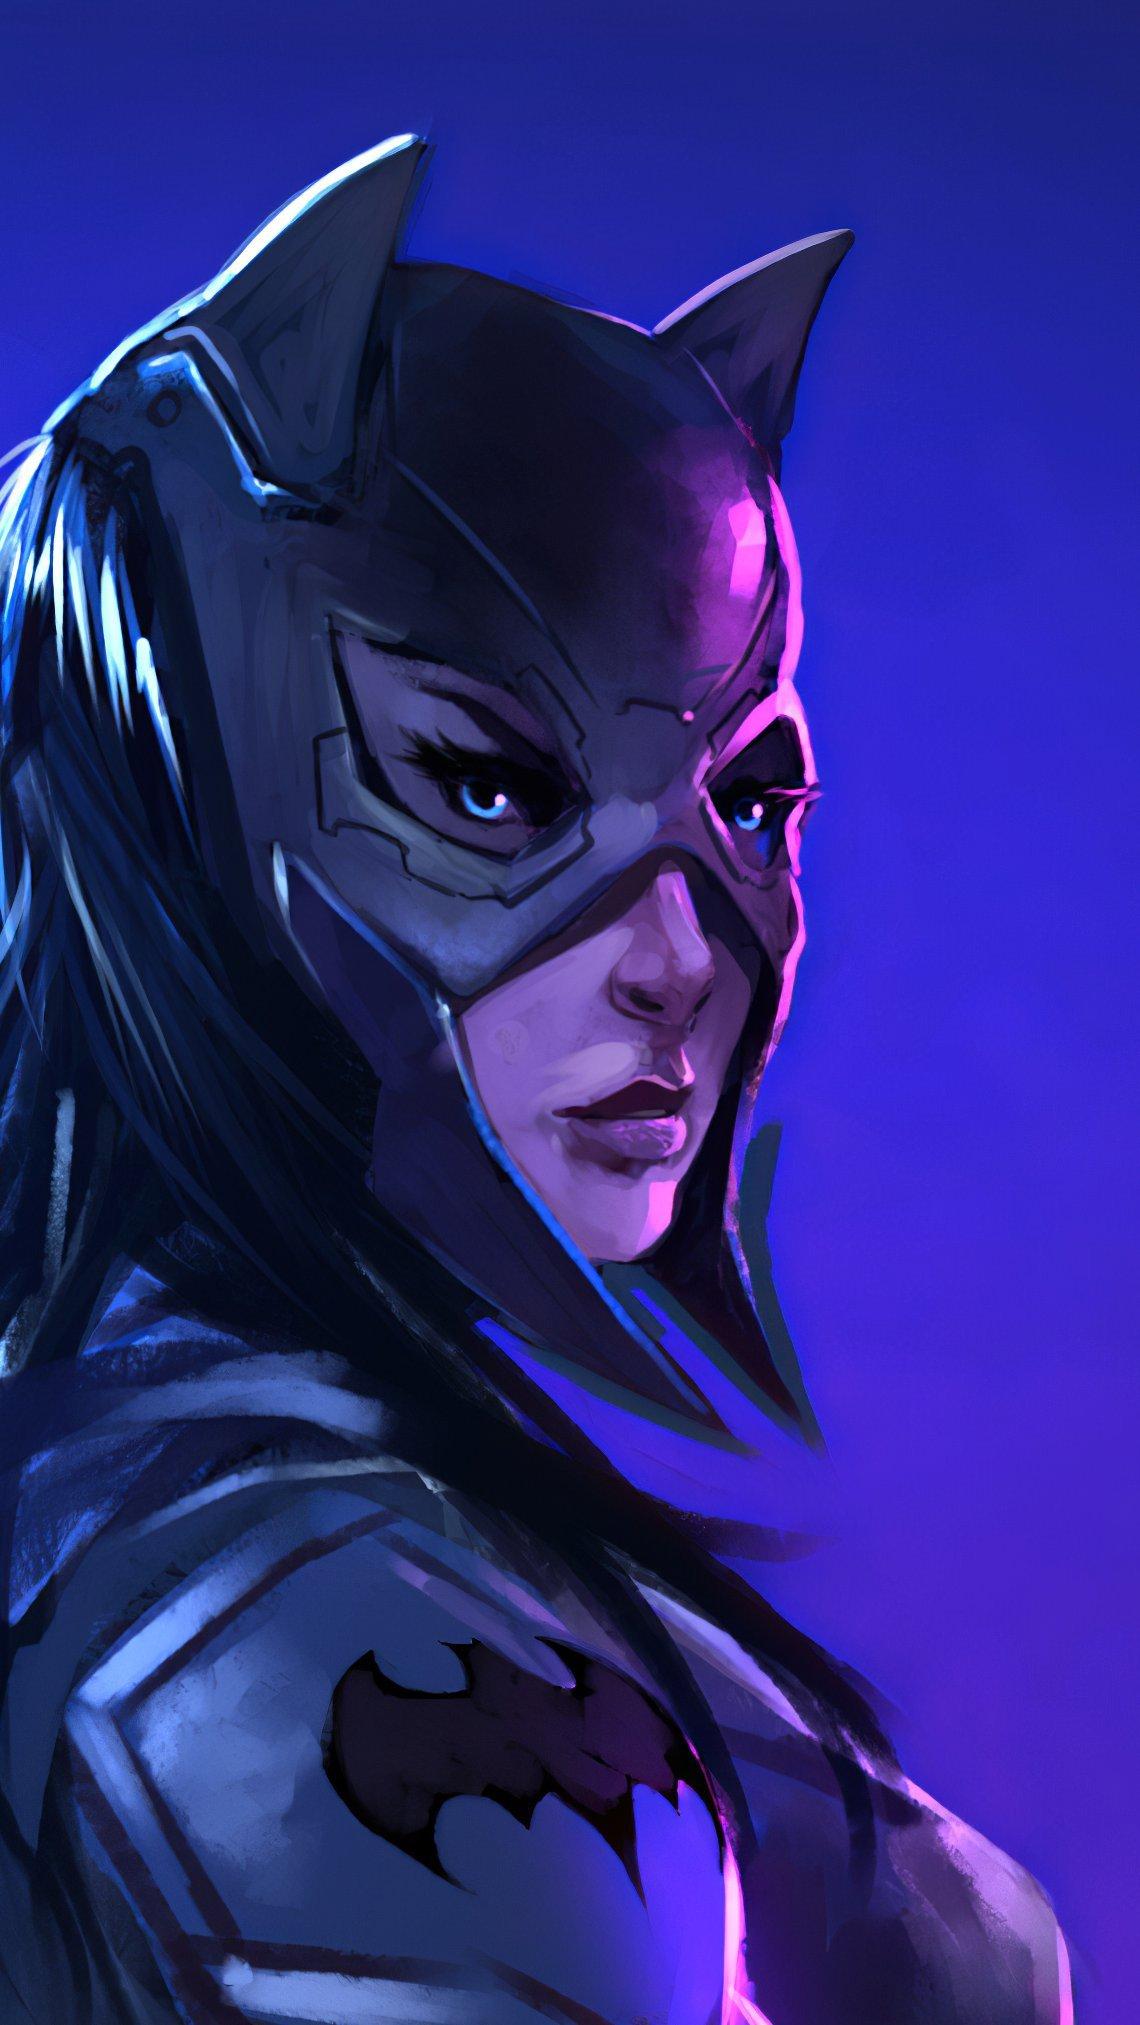 Fondos de pantalla Batwoman Artwork Vertical